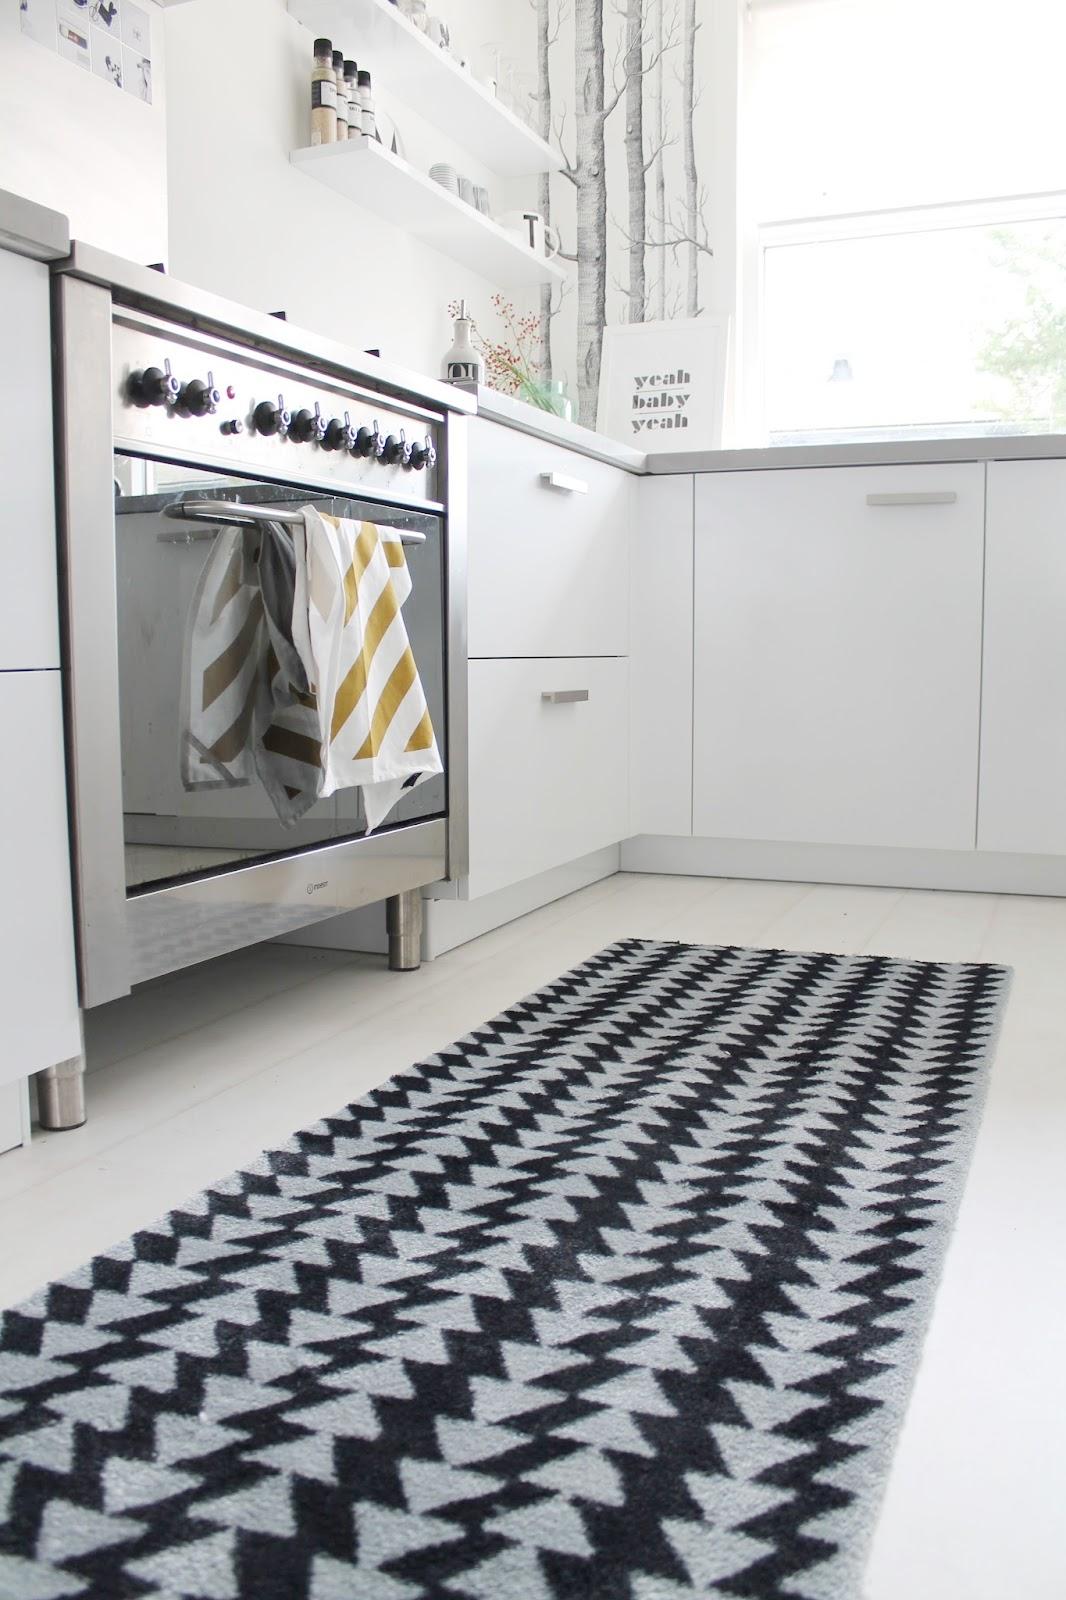 Missjettle : vloerkleden of matjes in de keuken